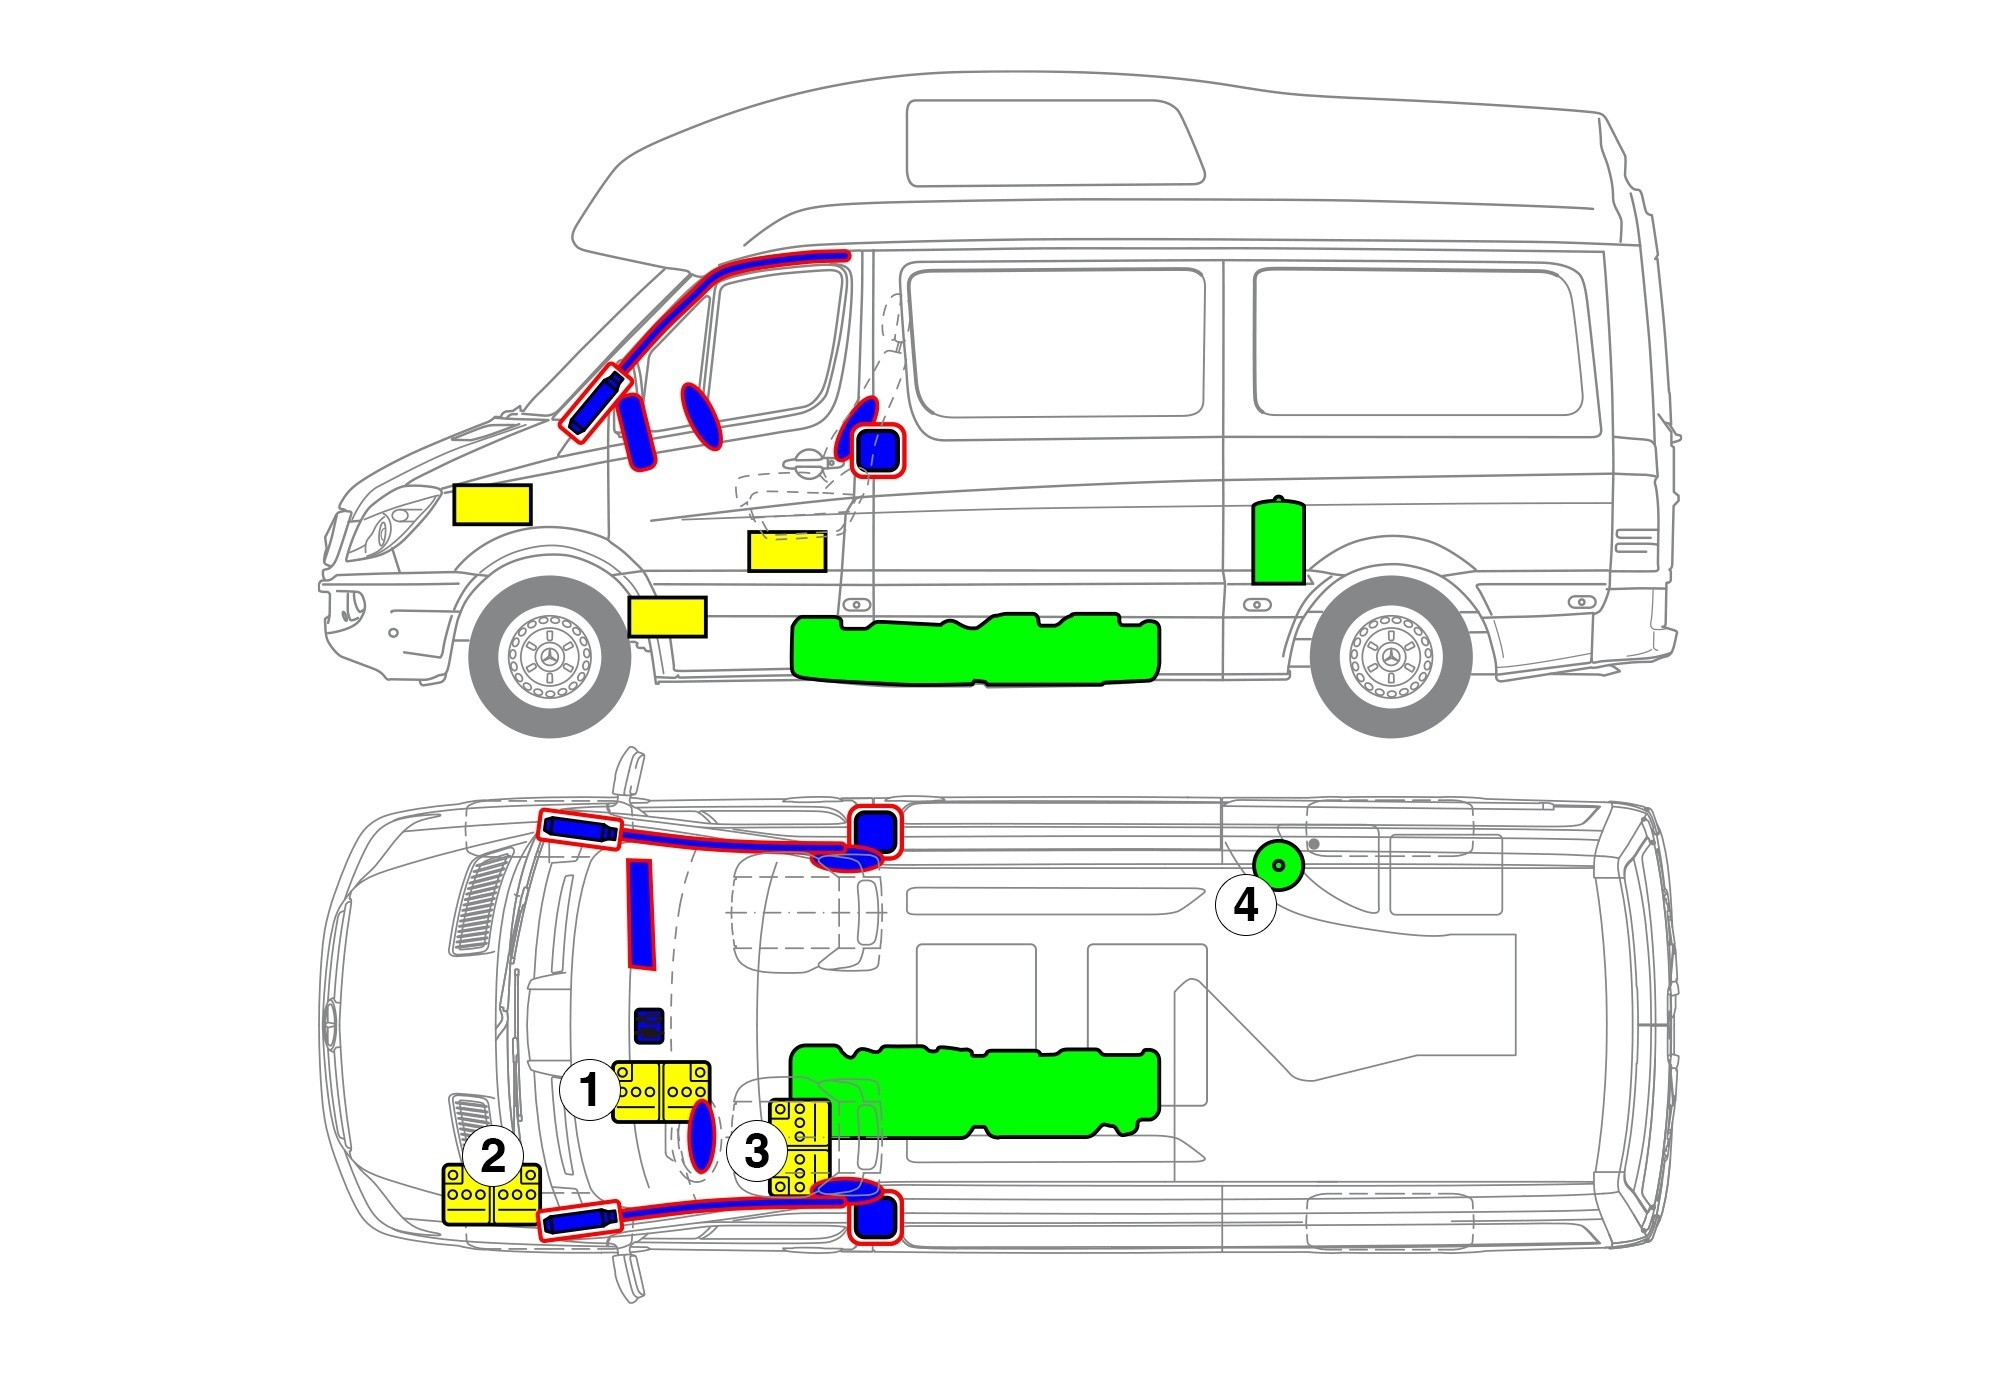 Sprinter JAMES COOK (Westfalia) Reisemobil, Typ 906